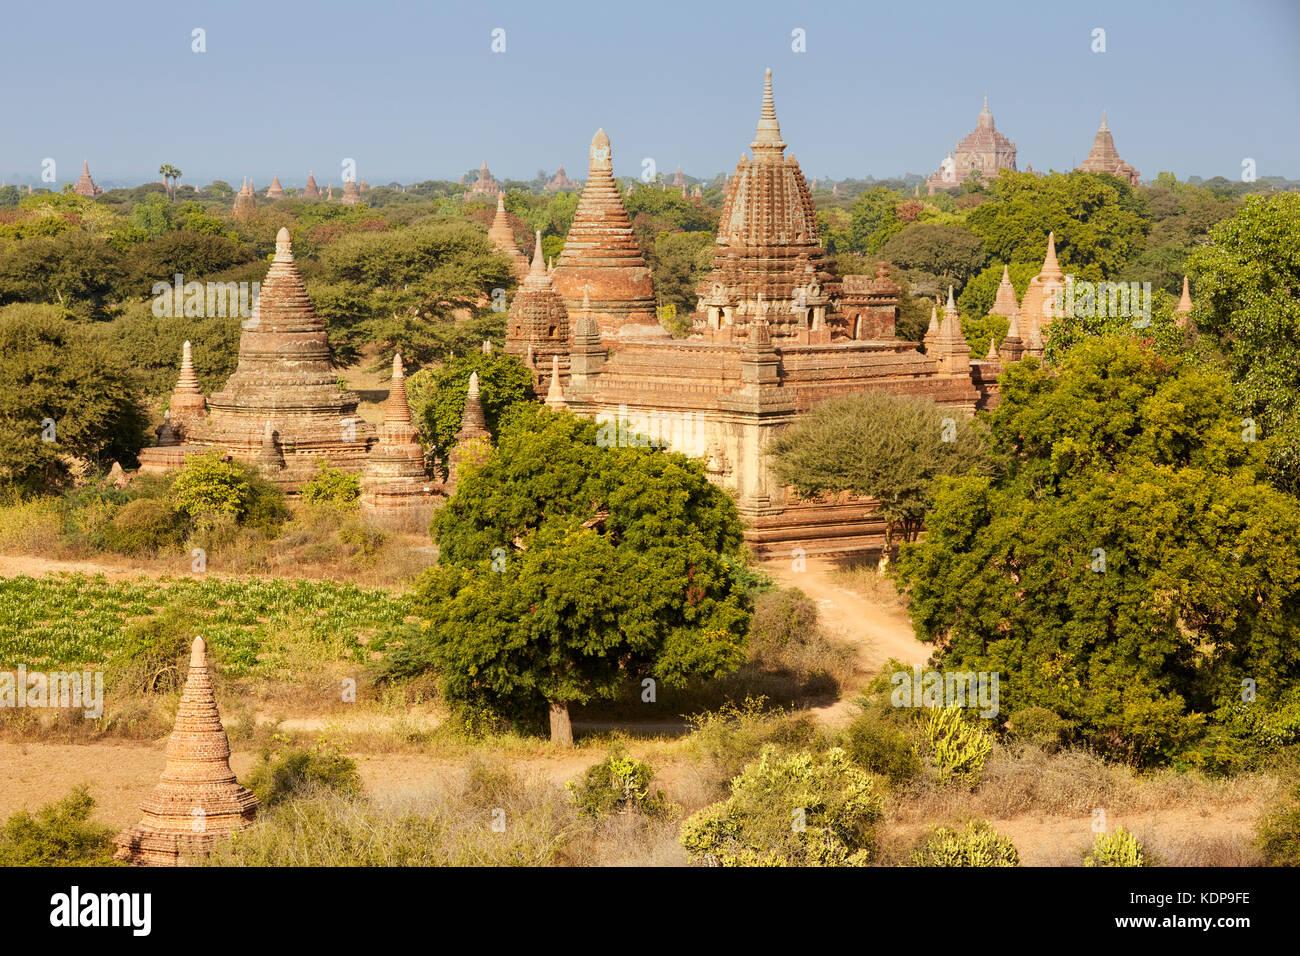 Northeast Temples, Bagan (Pagan), Myanmar (Burma), Southeast Asia - Stock Image